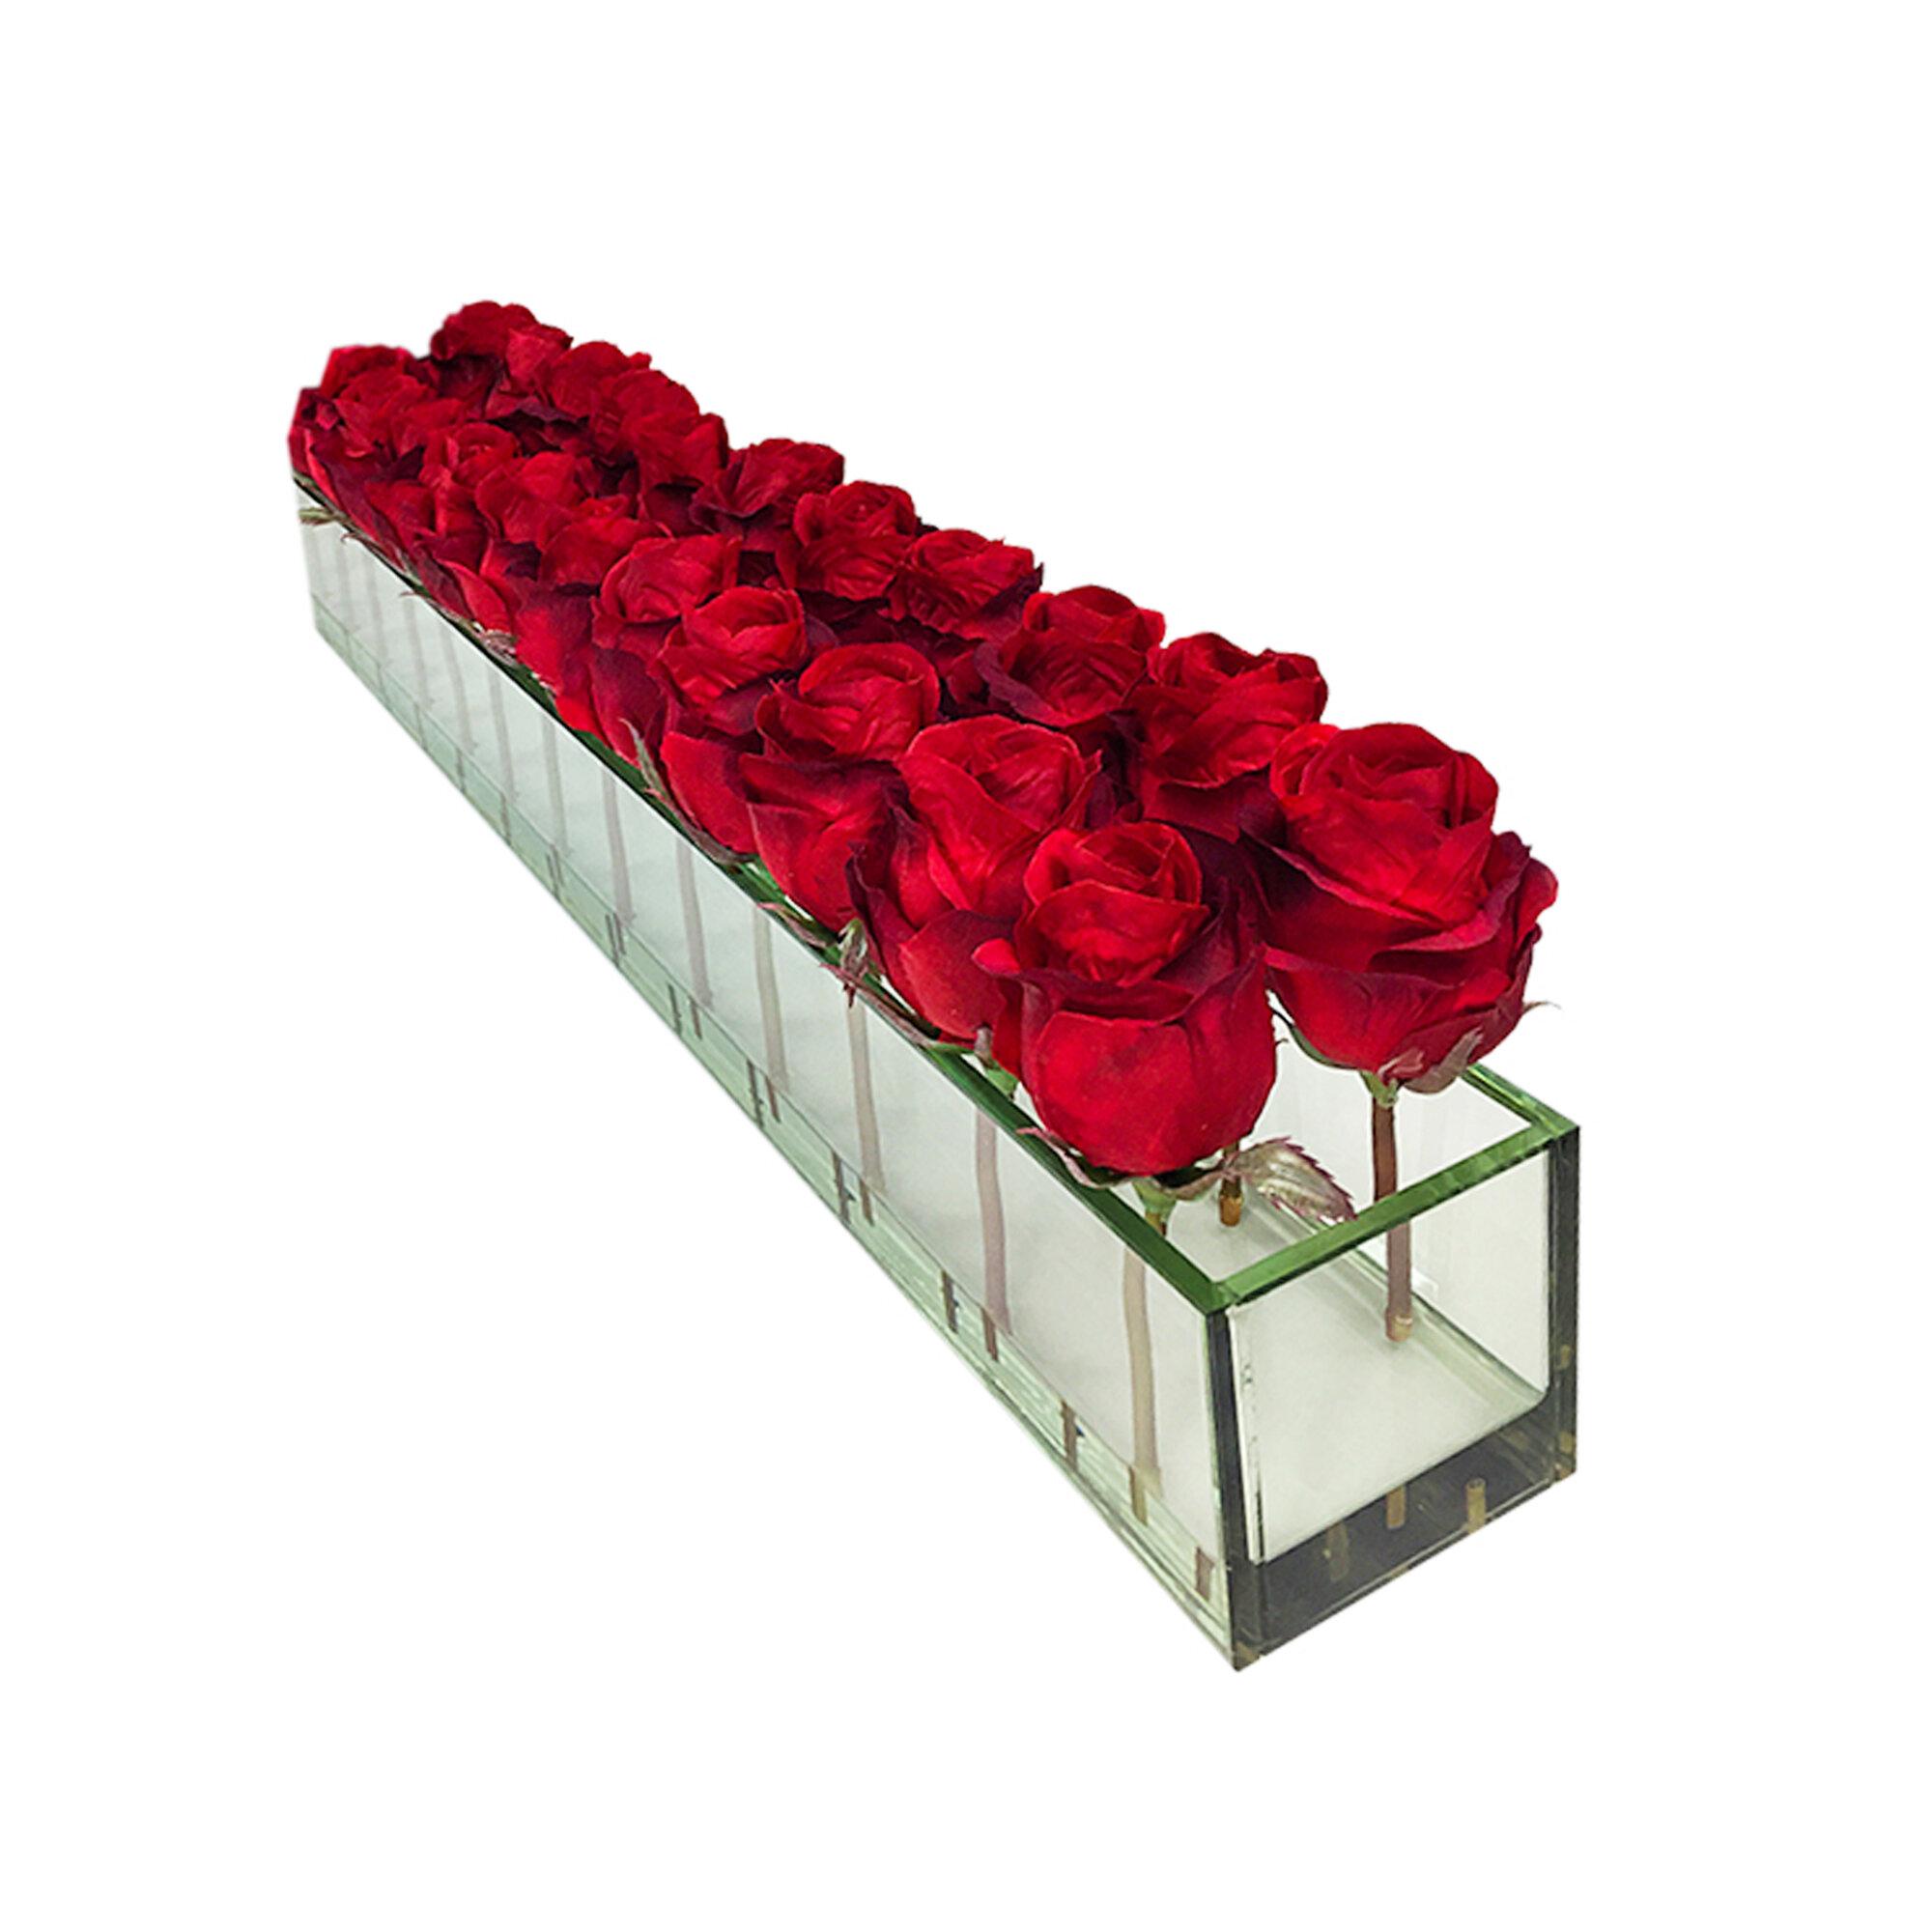 Picture of: Le Prise Roses Floral Arrangement In Glass Vase Reviews Wayfair